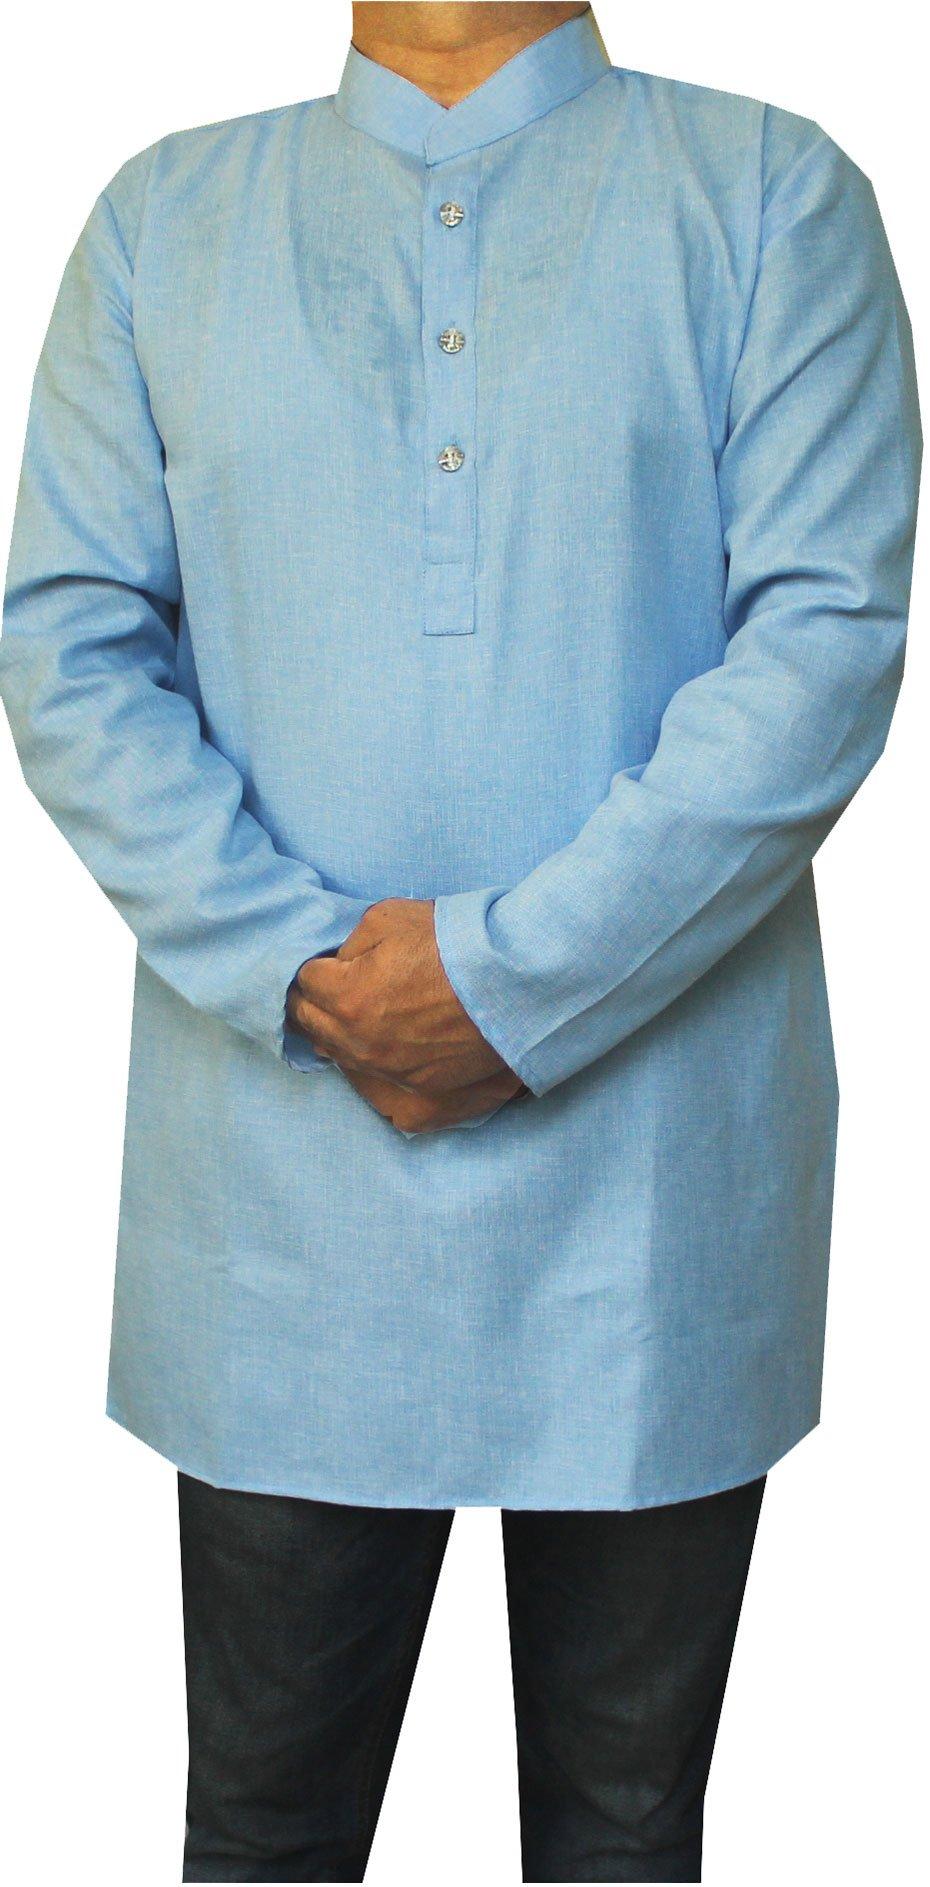 Cotton Dress Mens Short Kurta Shirt India Fashion Clothing (Blue, XL)